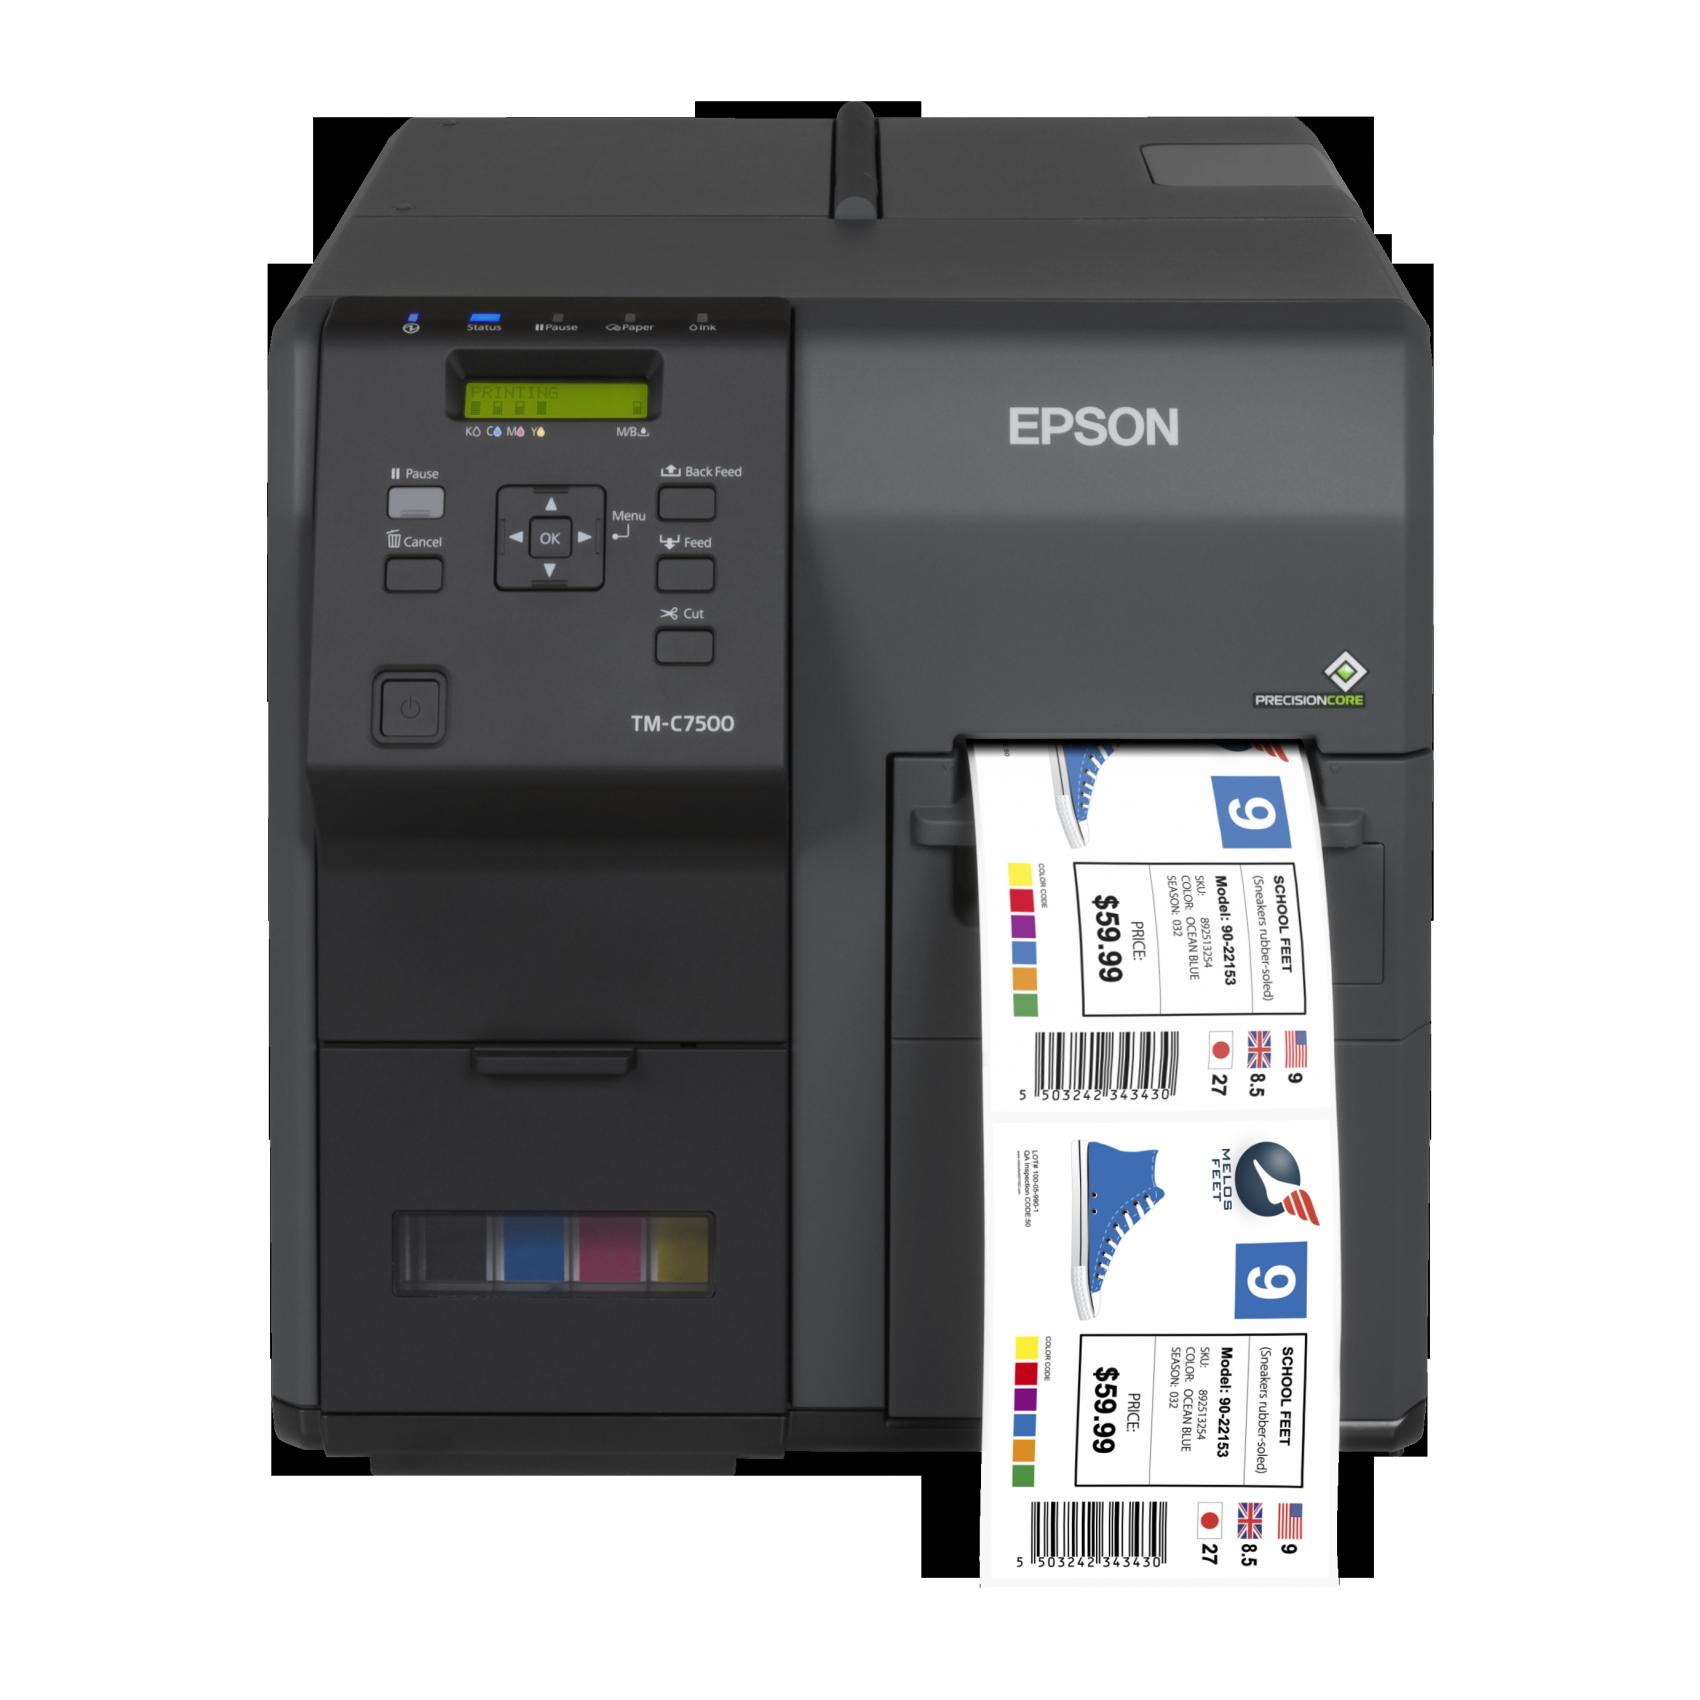 EPSON Label C7510 uPrinterShop.com